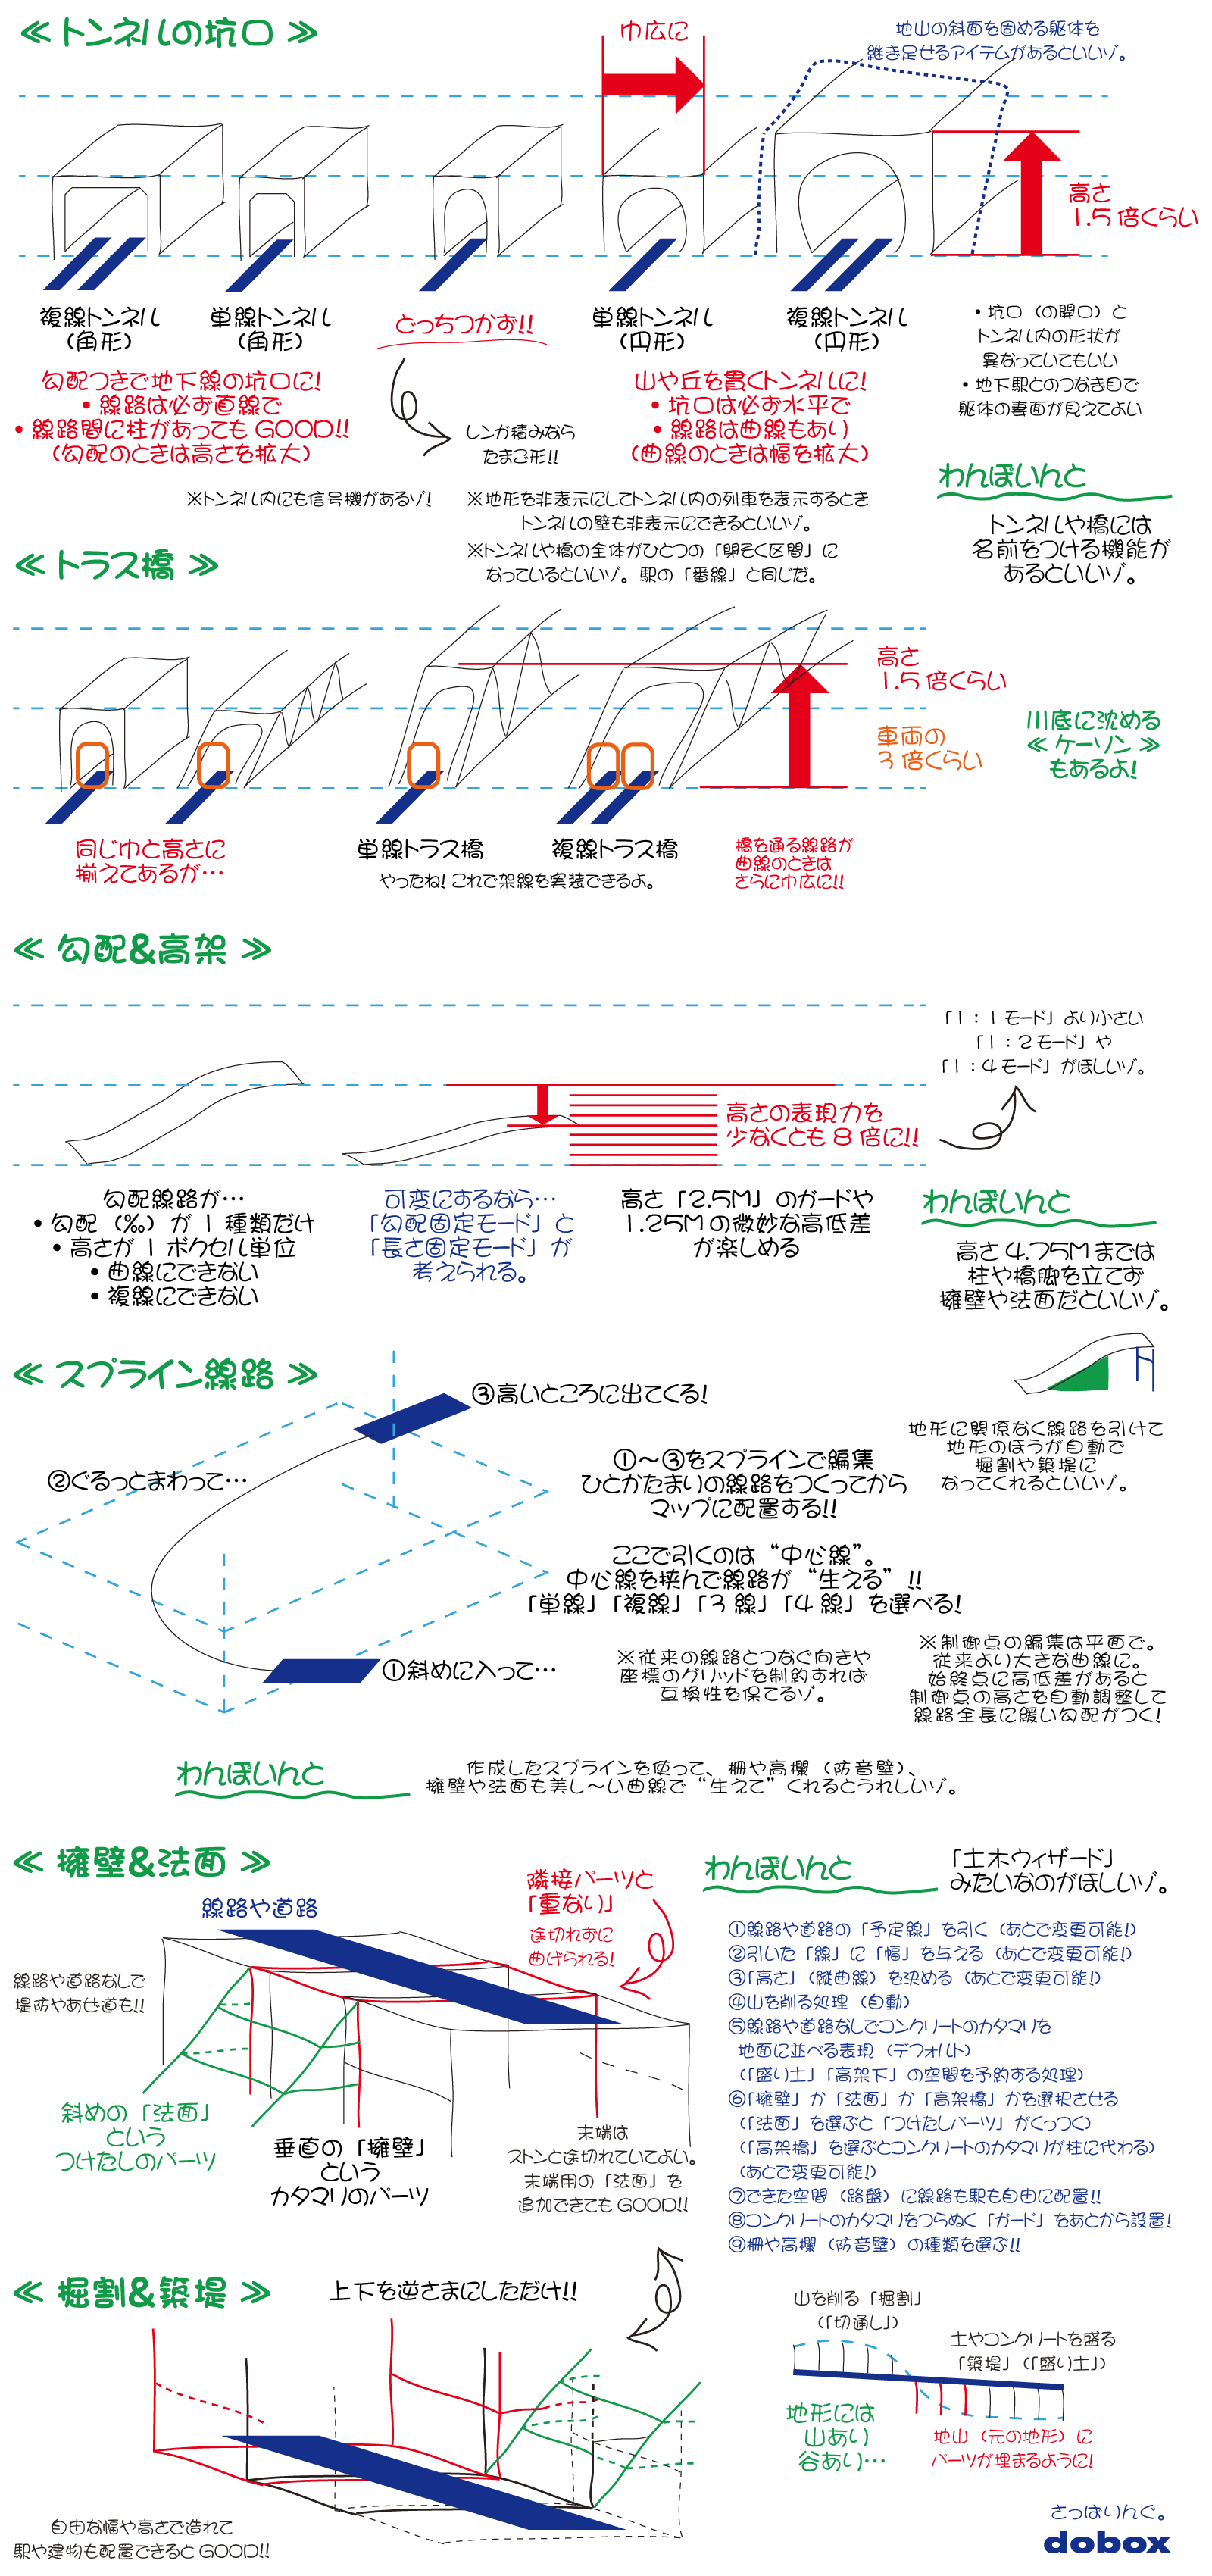 https://neorail.jp/forum/uploads/atrain_dobox.png